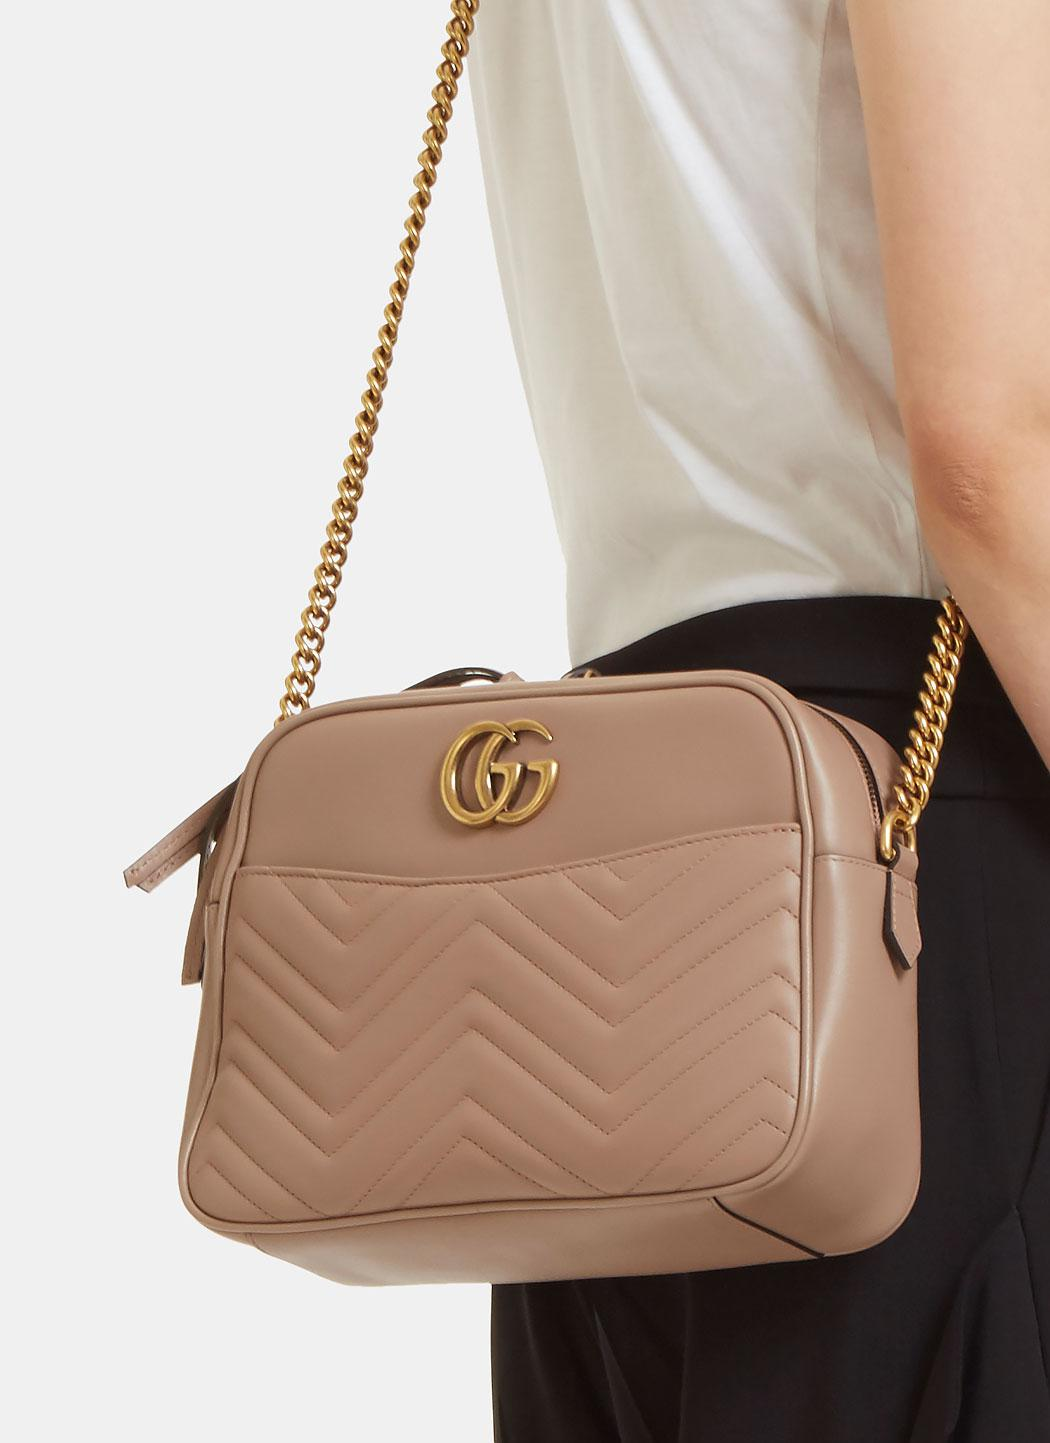 0e7568606 Gucci Gg Marmont Matelassé Medium Shoulder Bag In Taupe in Natural ...